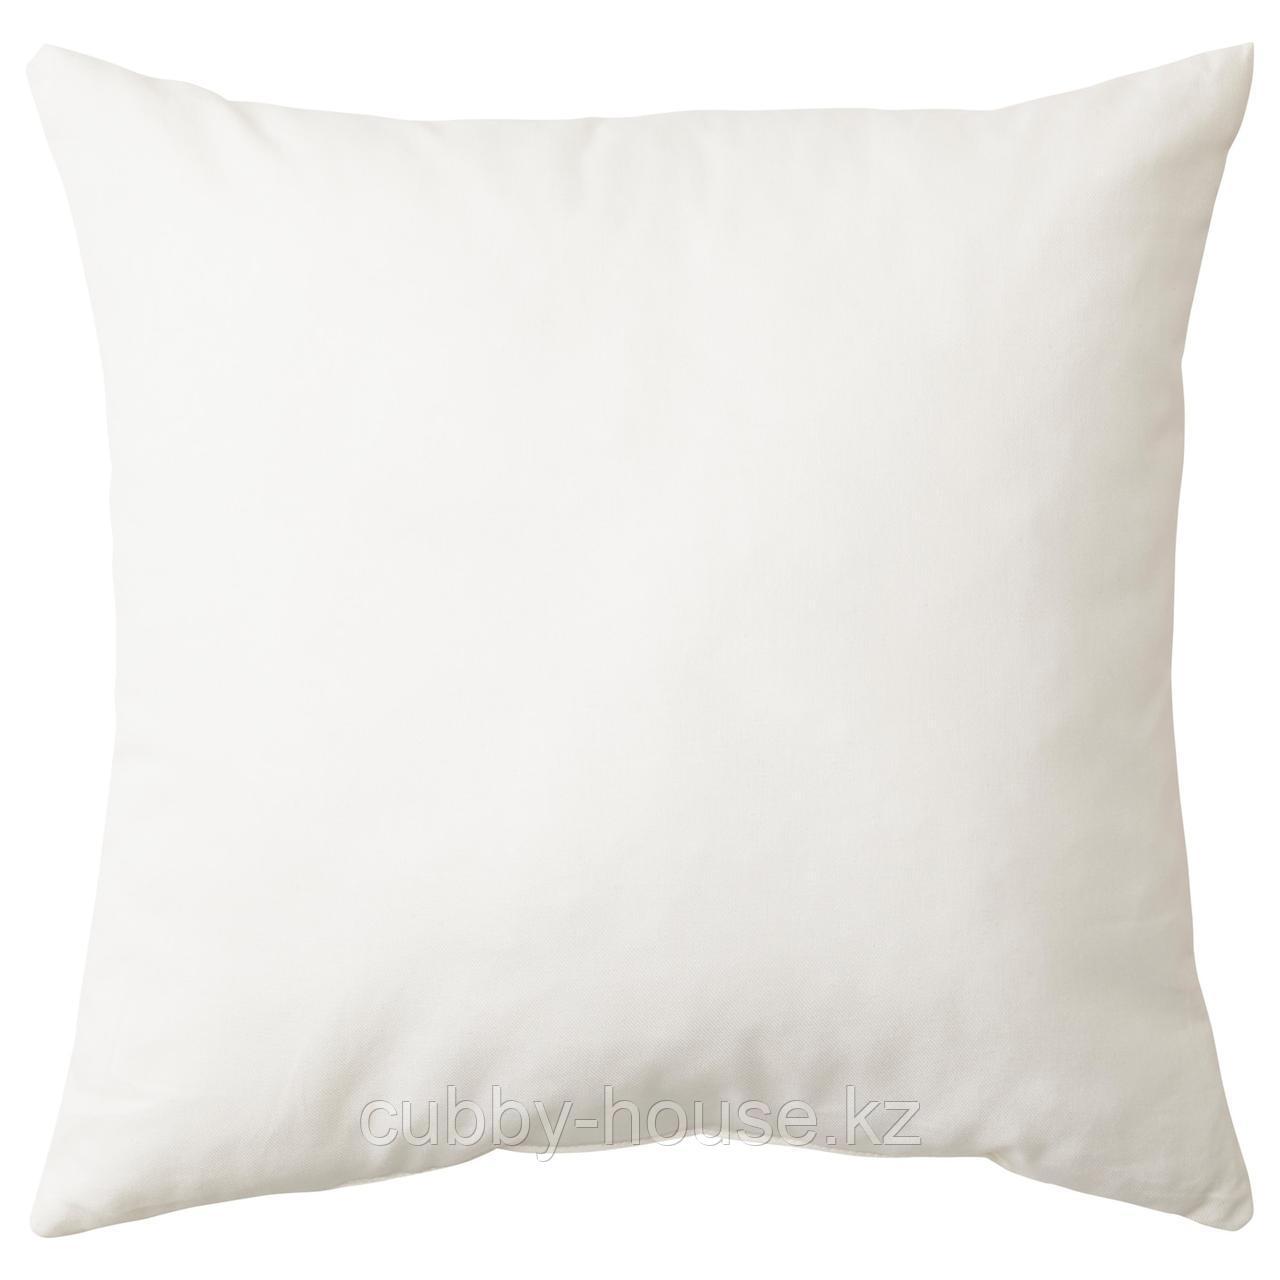 ВАЛЬБЬЁРГ Подушка, белый, 50x50 см